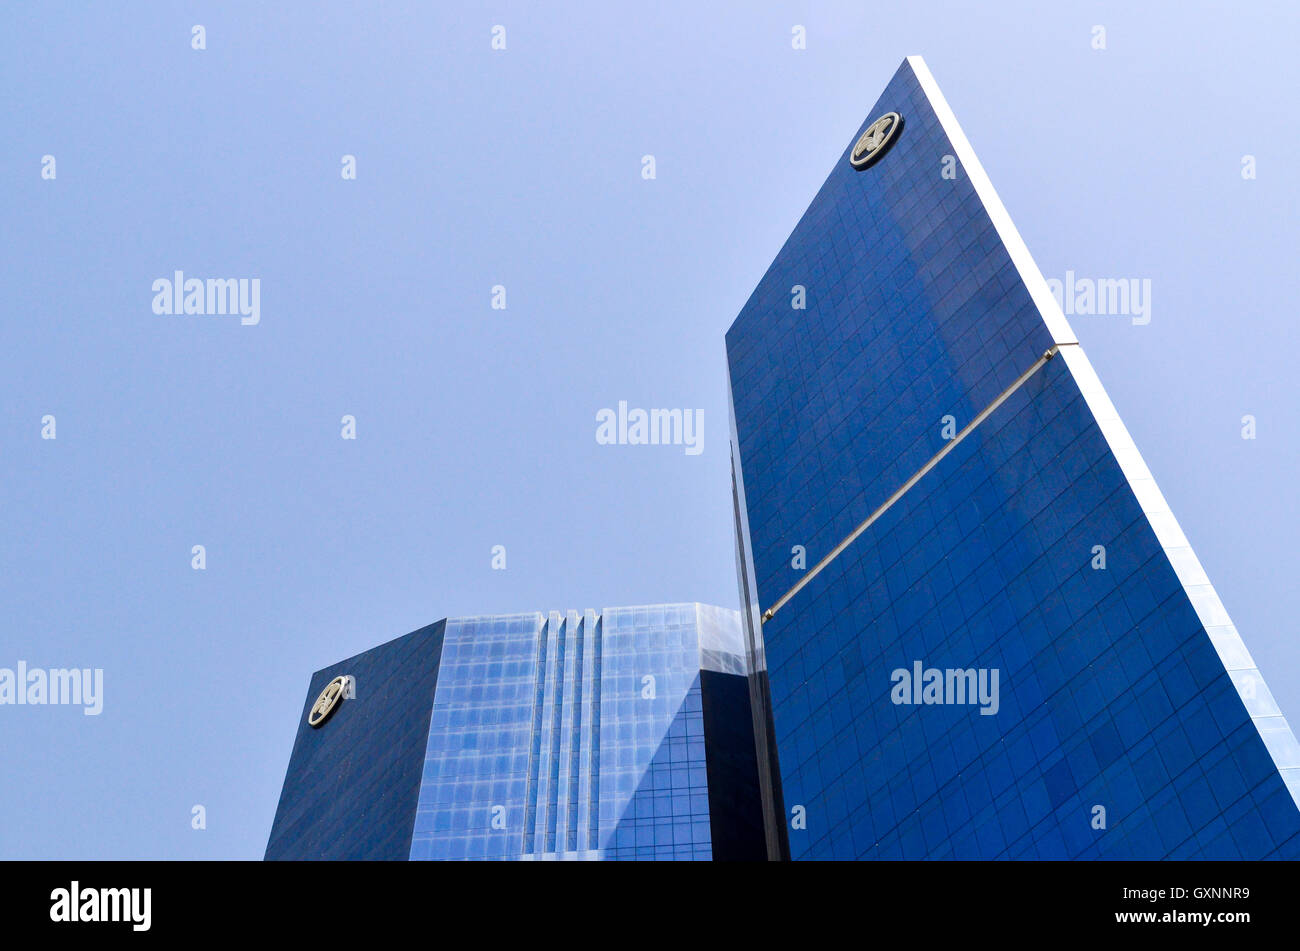 Samrya Twin Towers in Doha, Qatar - Stock Image